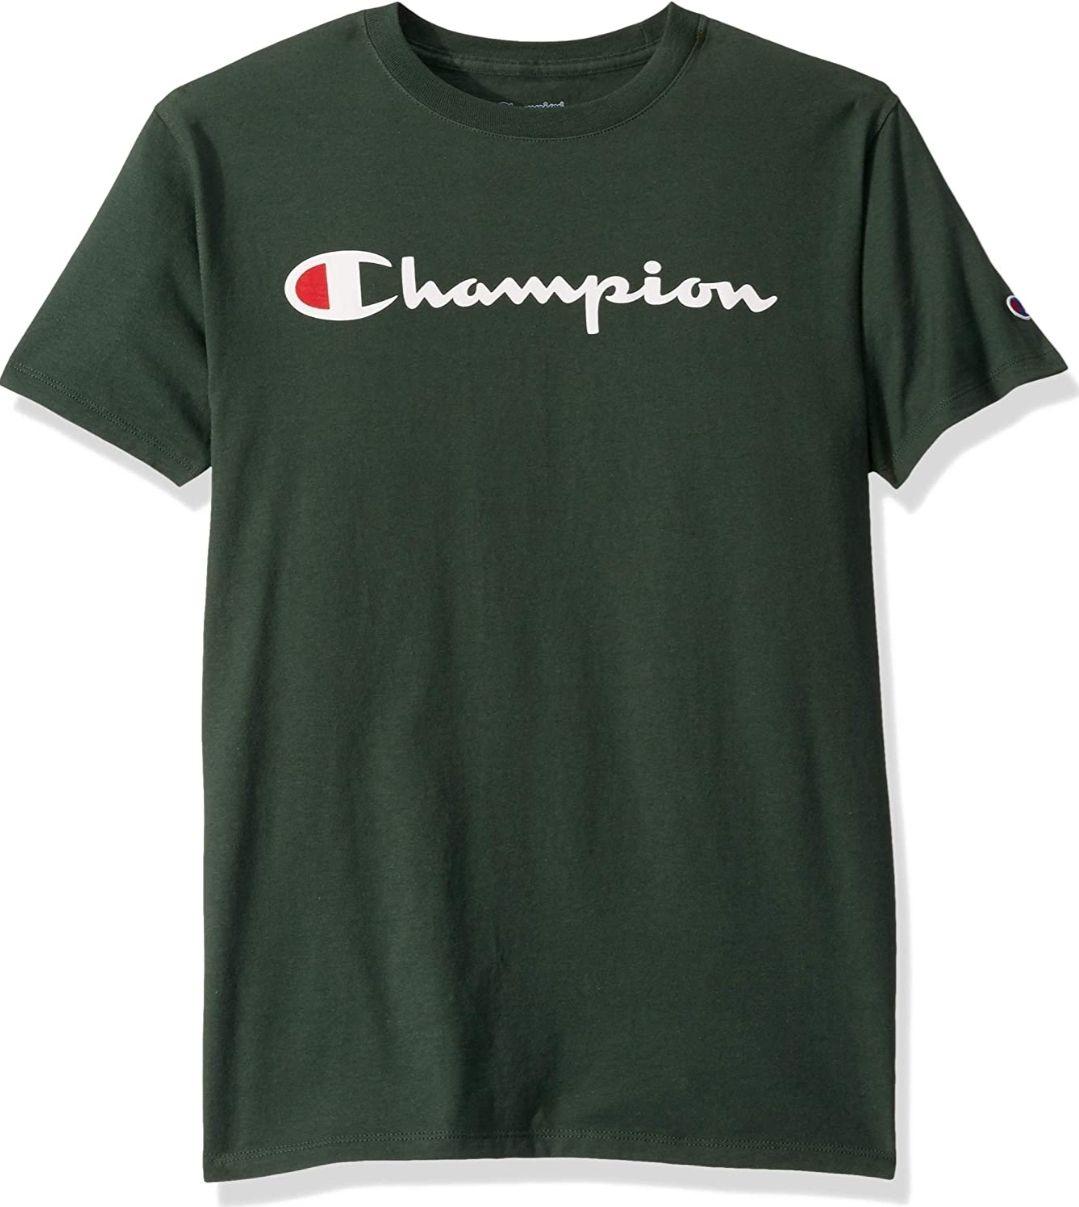 Amazon: Playeras Champion